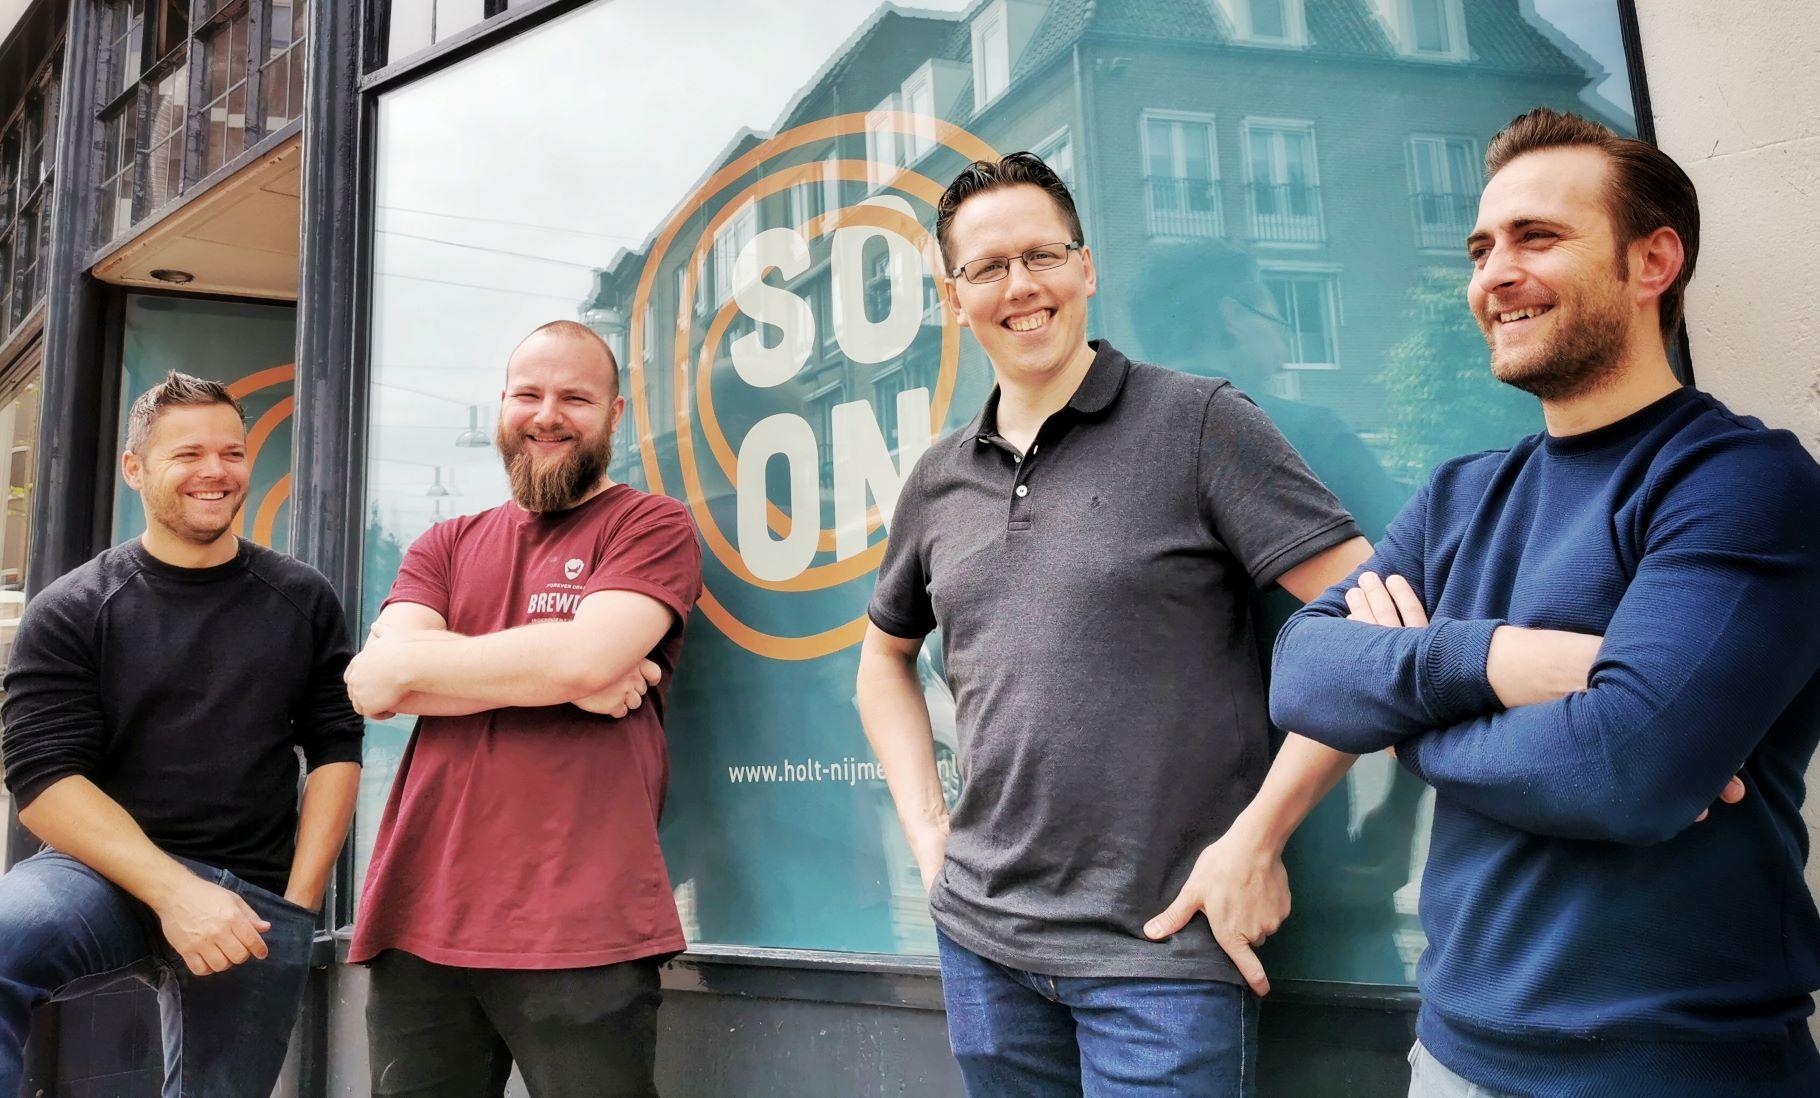 Nieuw in Nijmegen: all day cafe HOLT